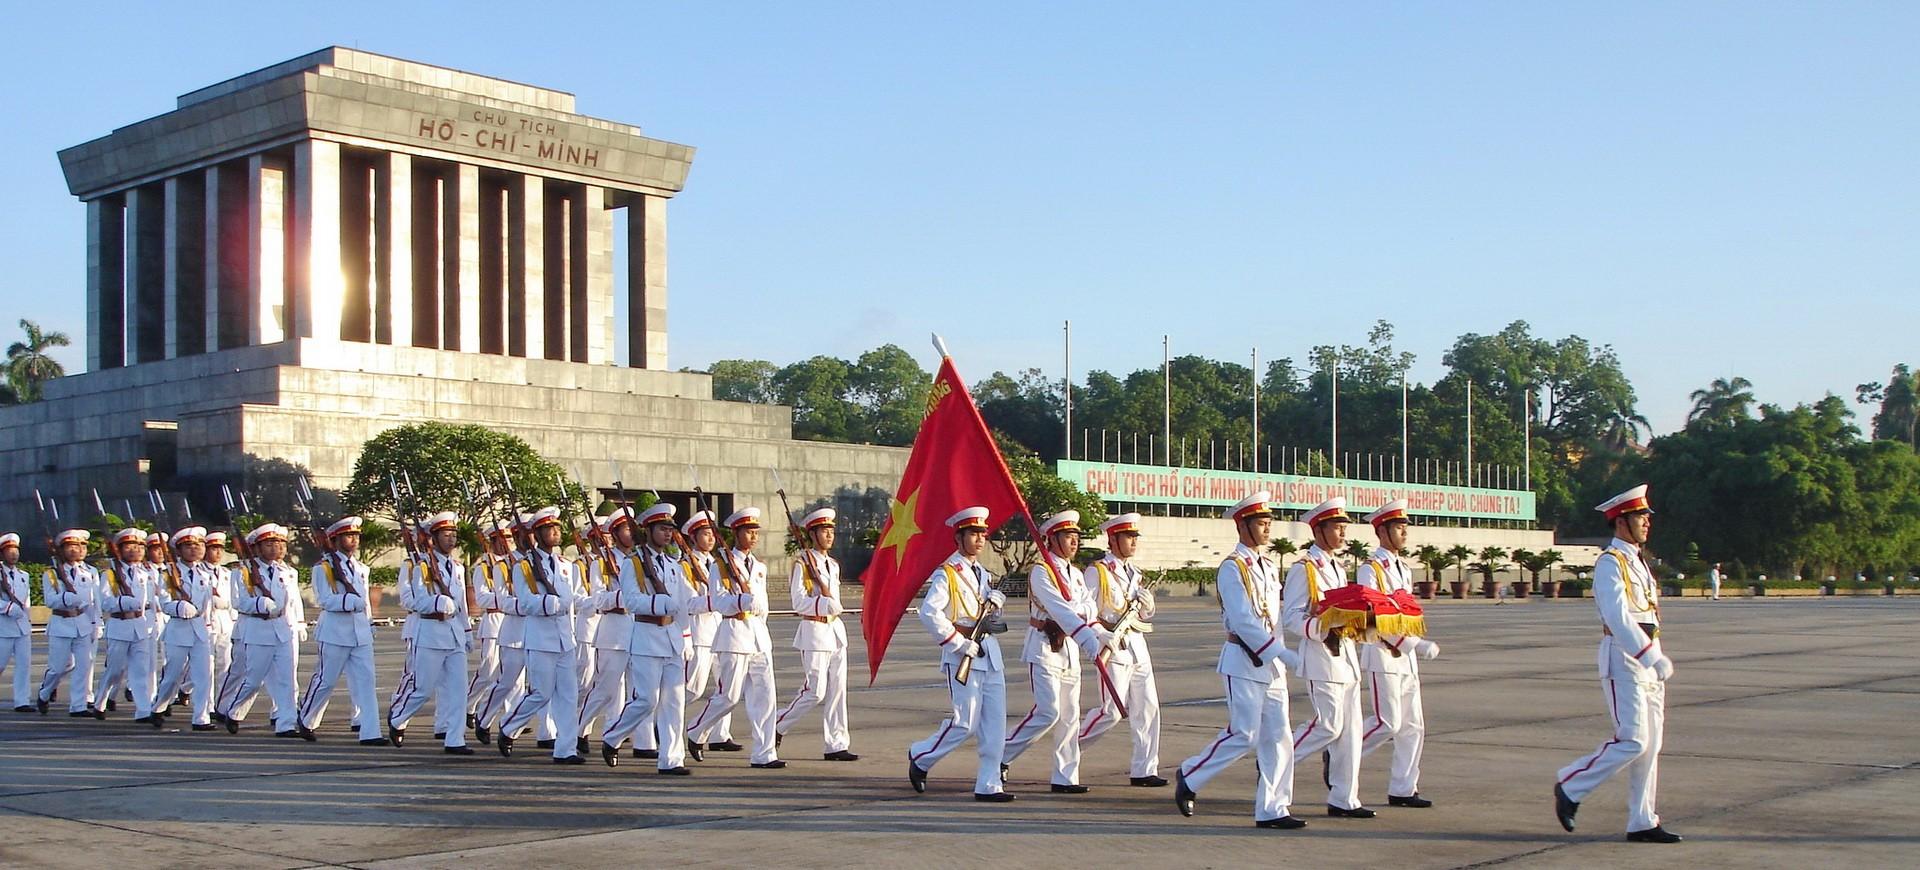 Vietnam Hanoi Mausolé Ho Chi Minh